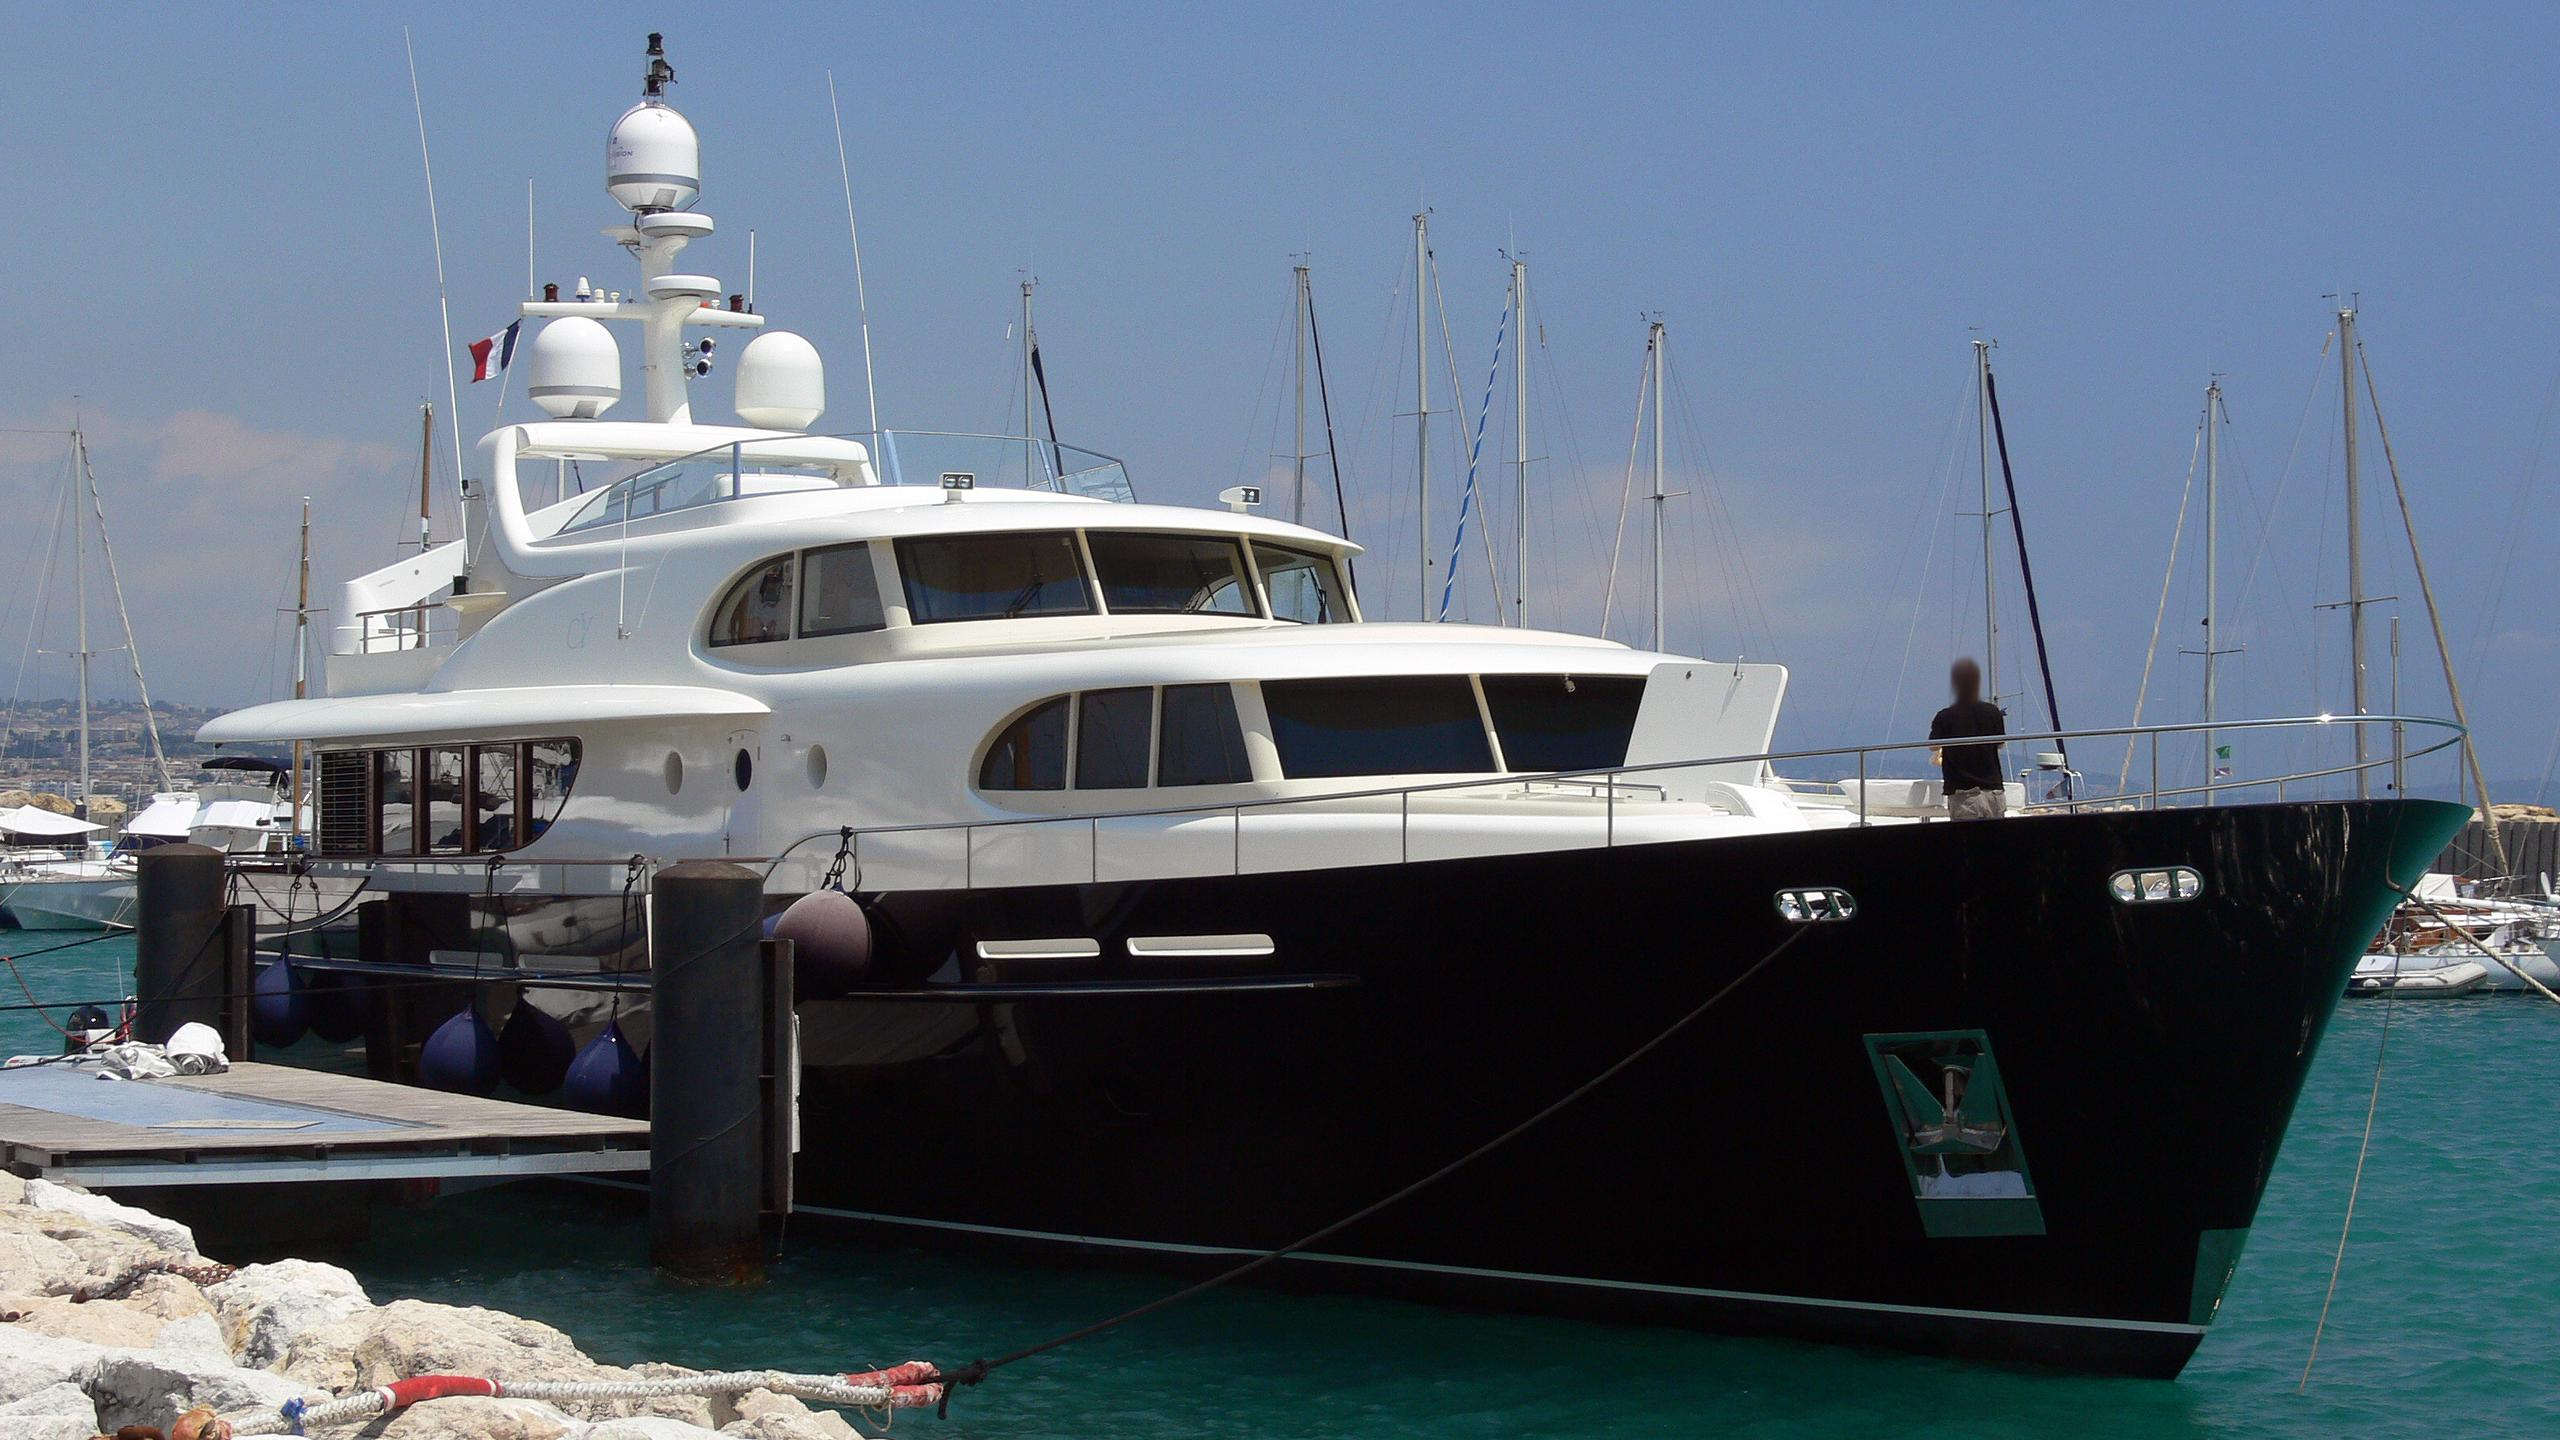 angel-of-joy-yacht-exterior